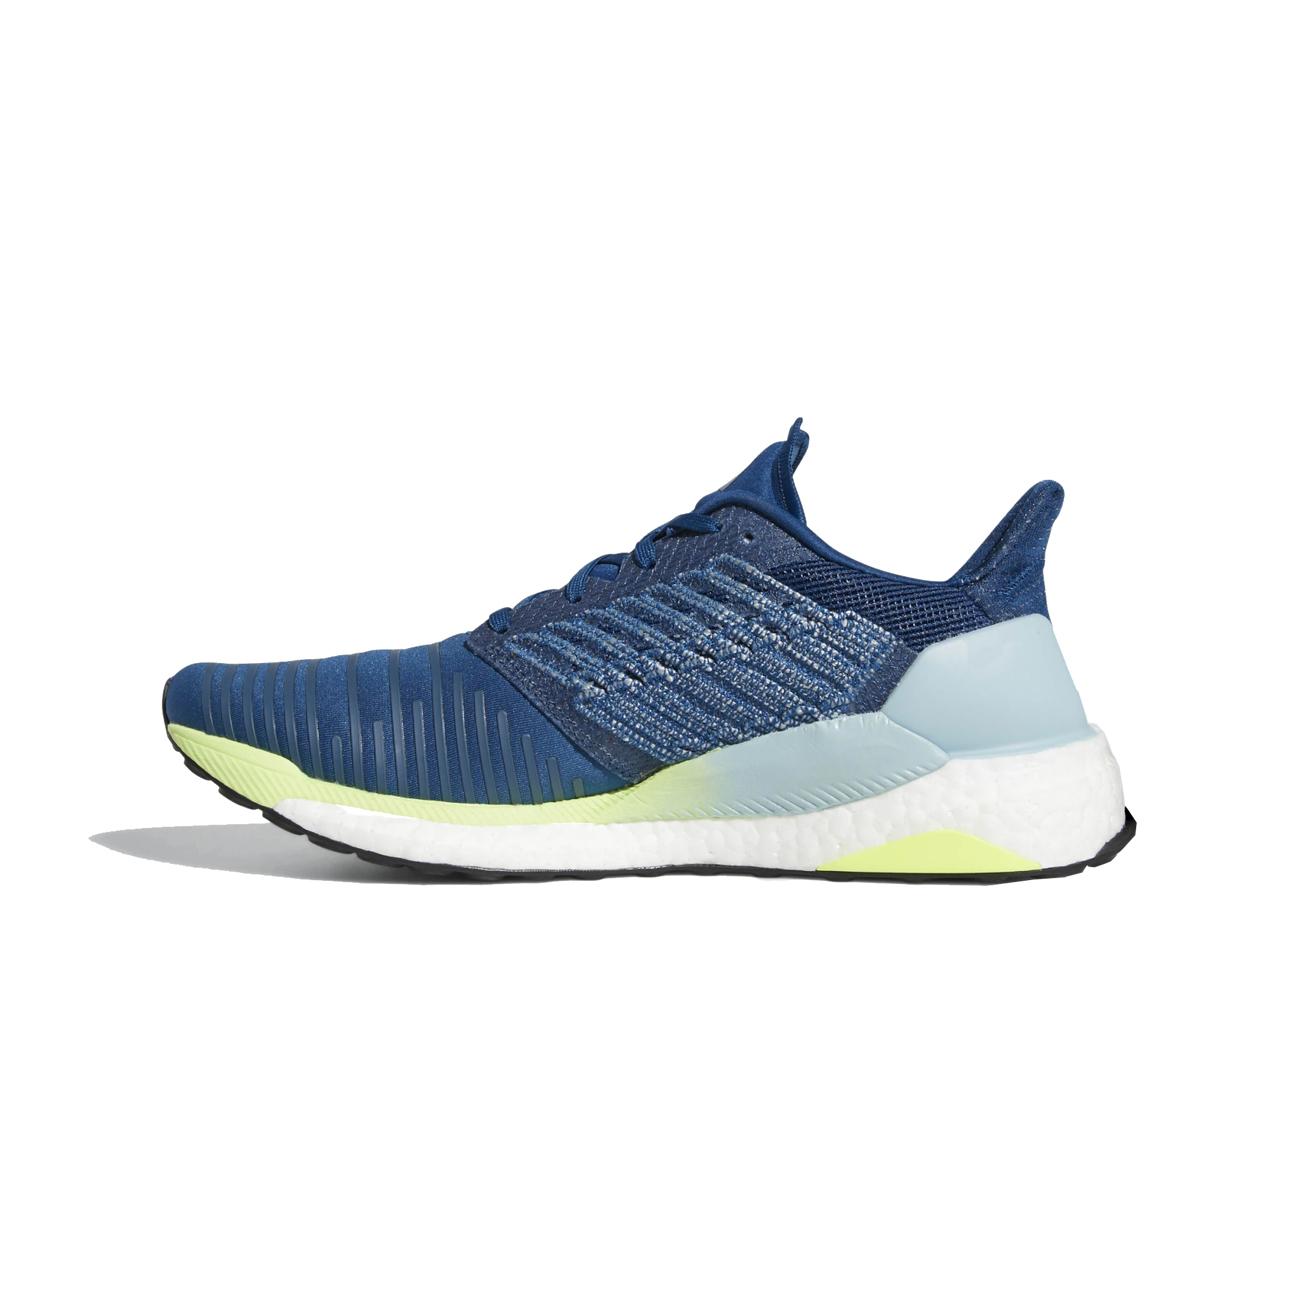 a63133a58449f Adidas Men s Solar Boost Running Shoes - Legend Marine